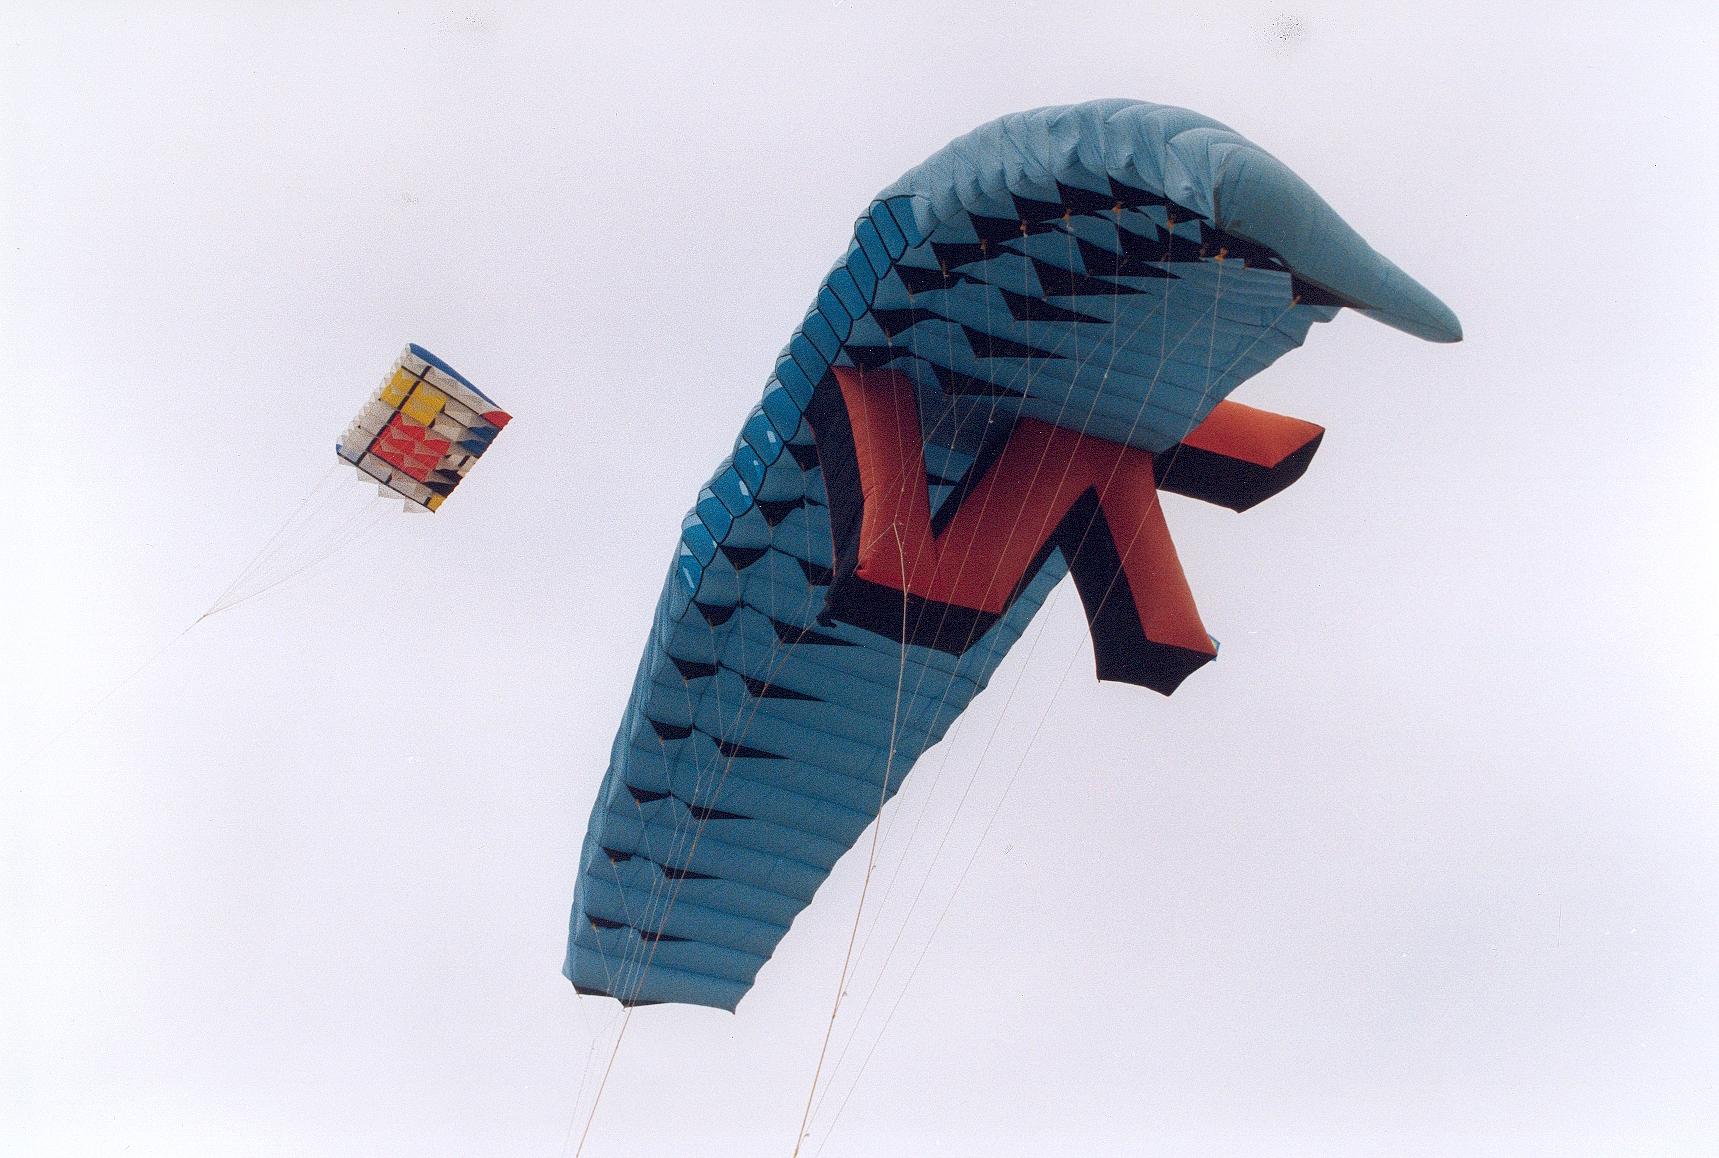 biggest_stunt_kite_1